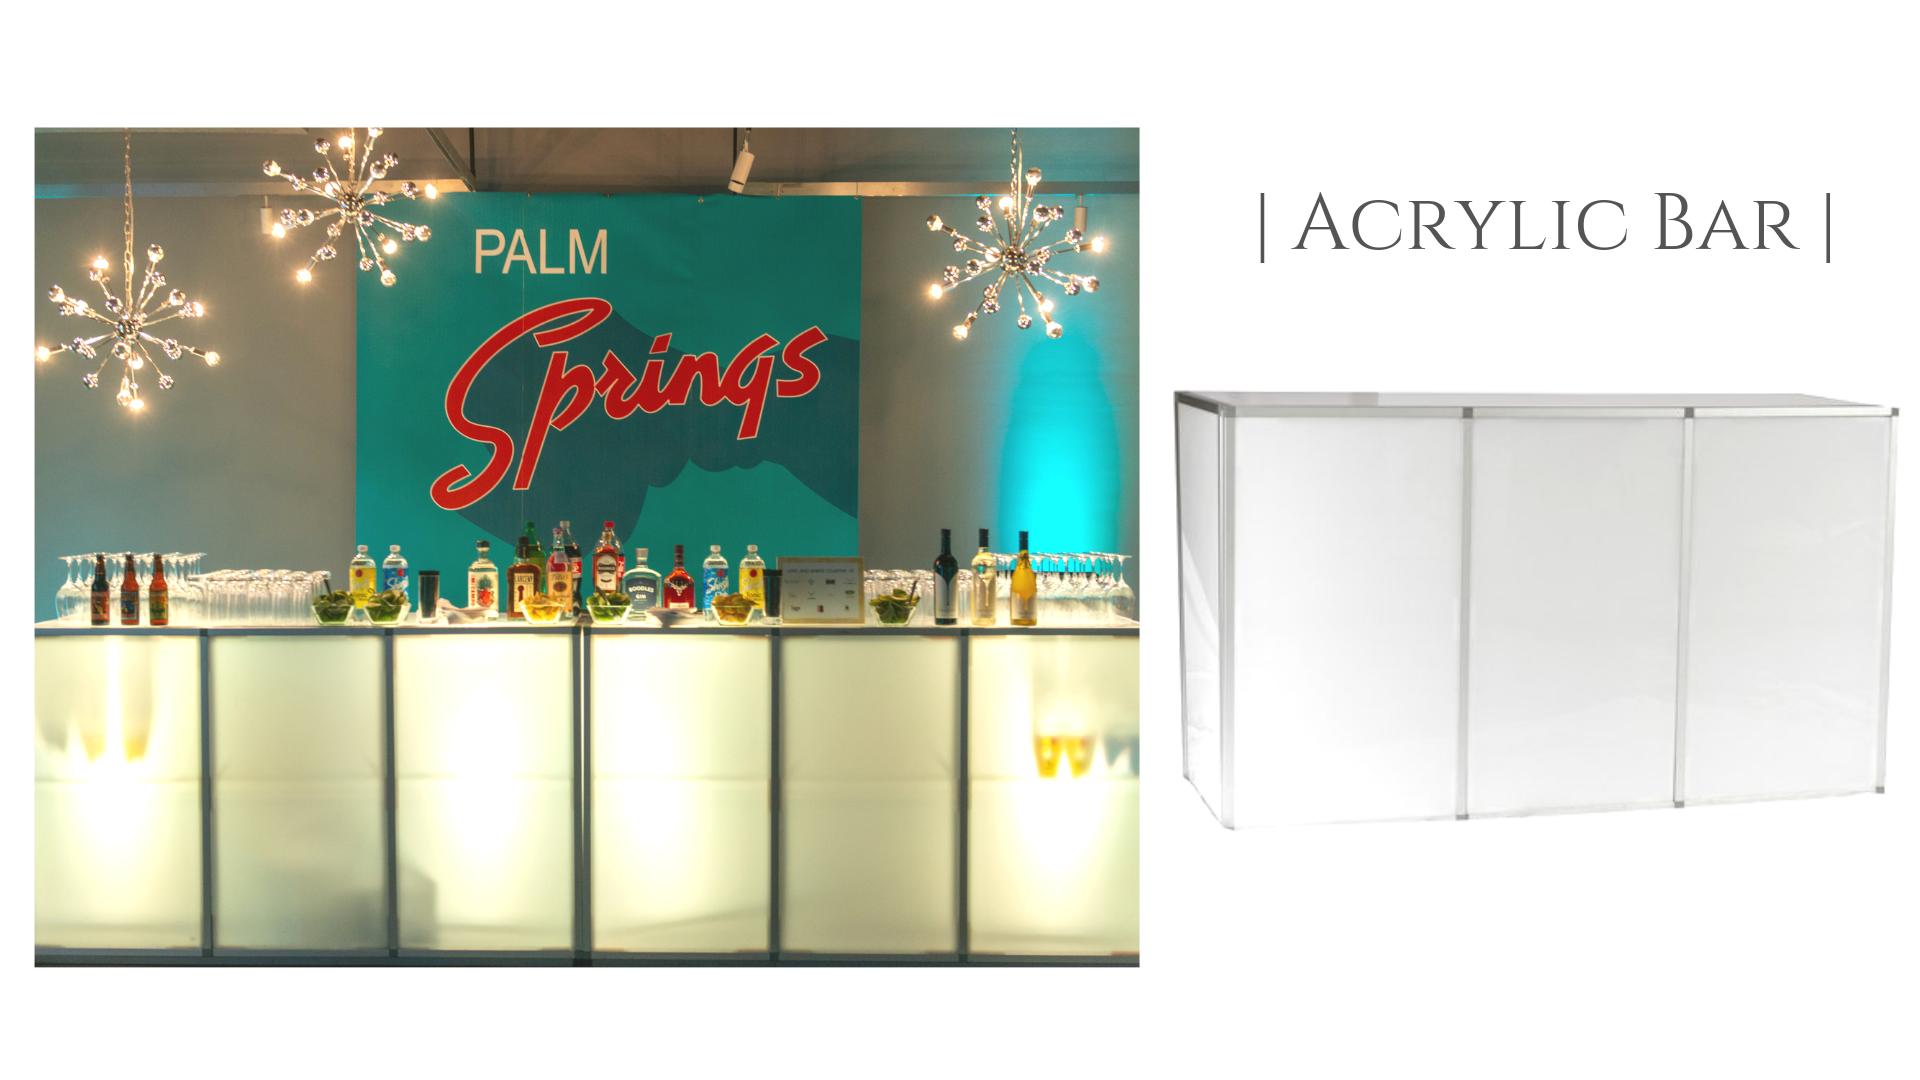 Acrylic Bar